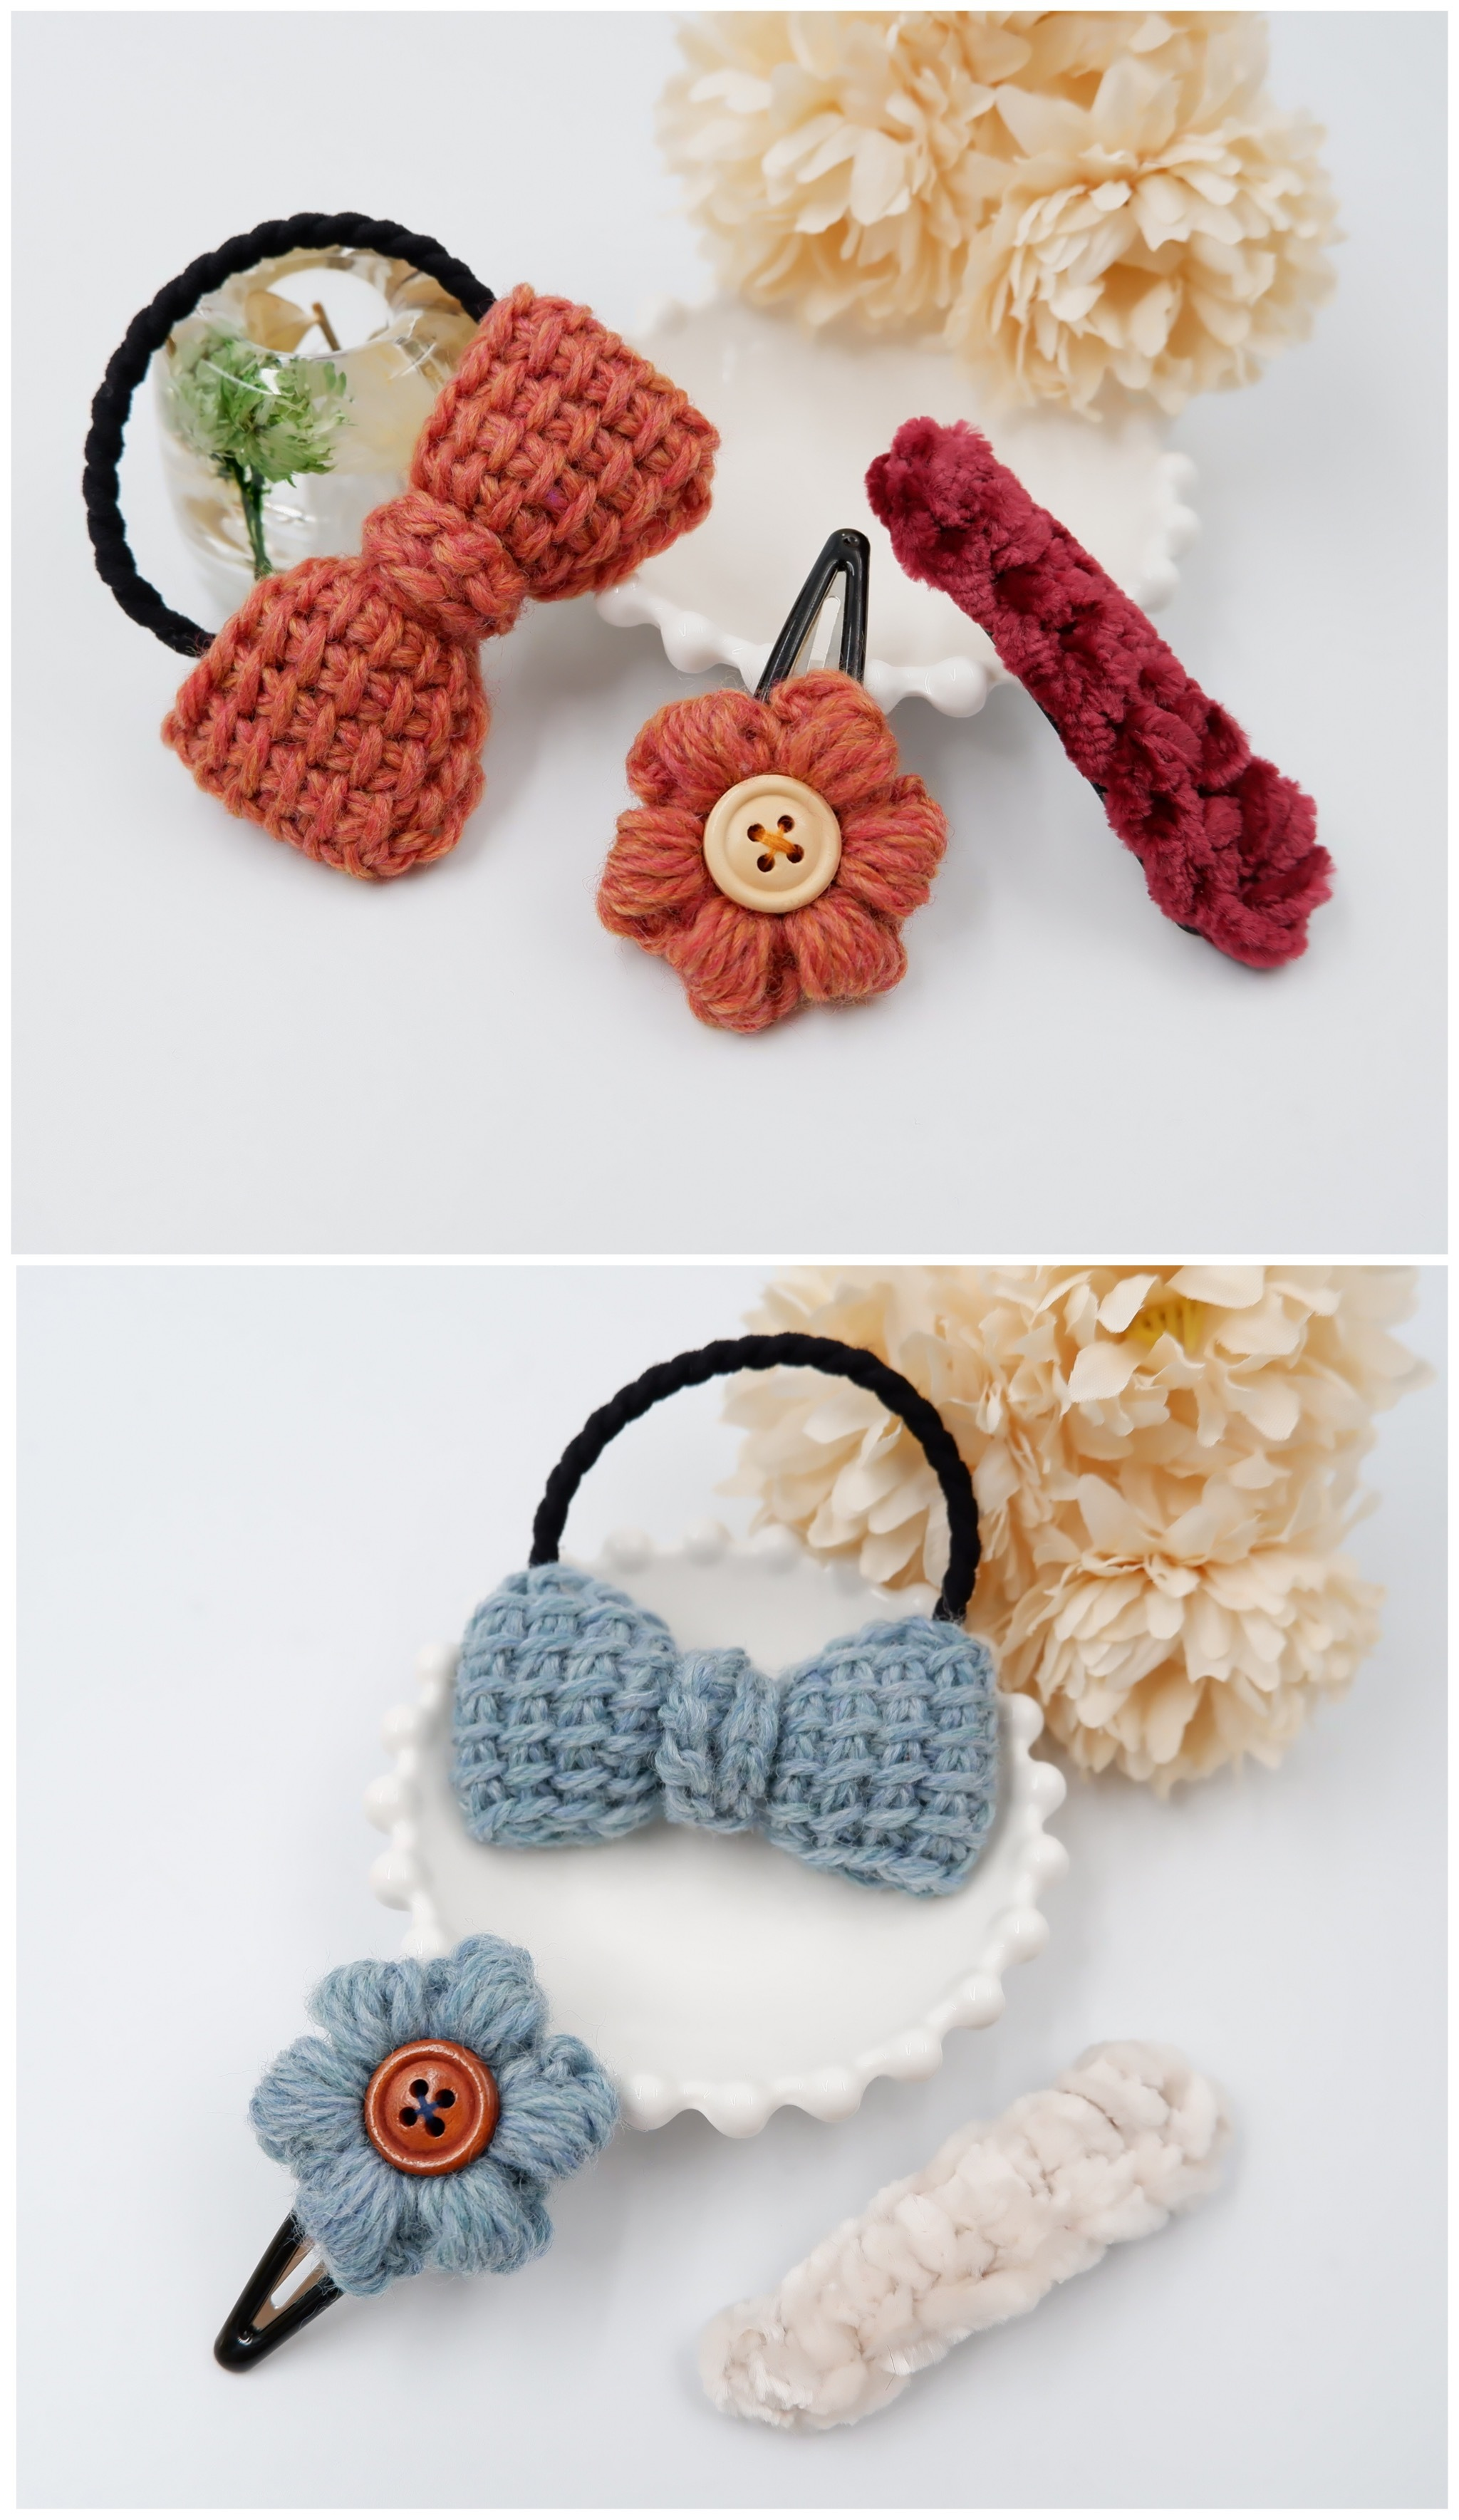 HanahanD 手編み雑貨 リボン 花 ヘアゴム パッチン 福袋